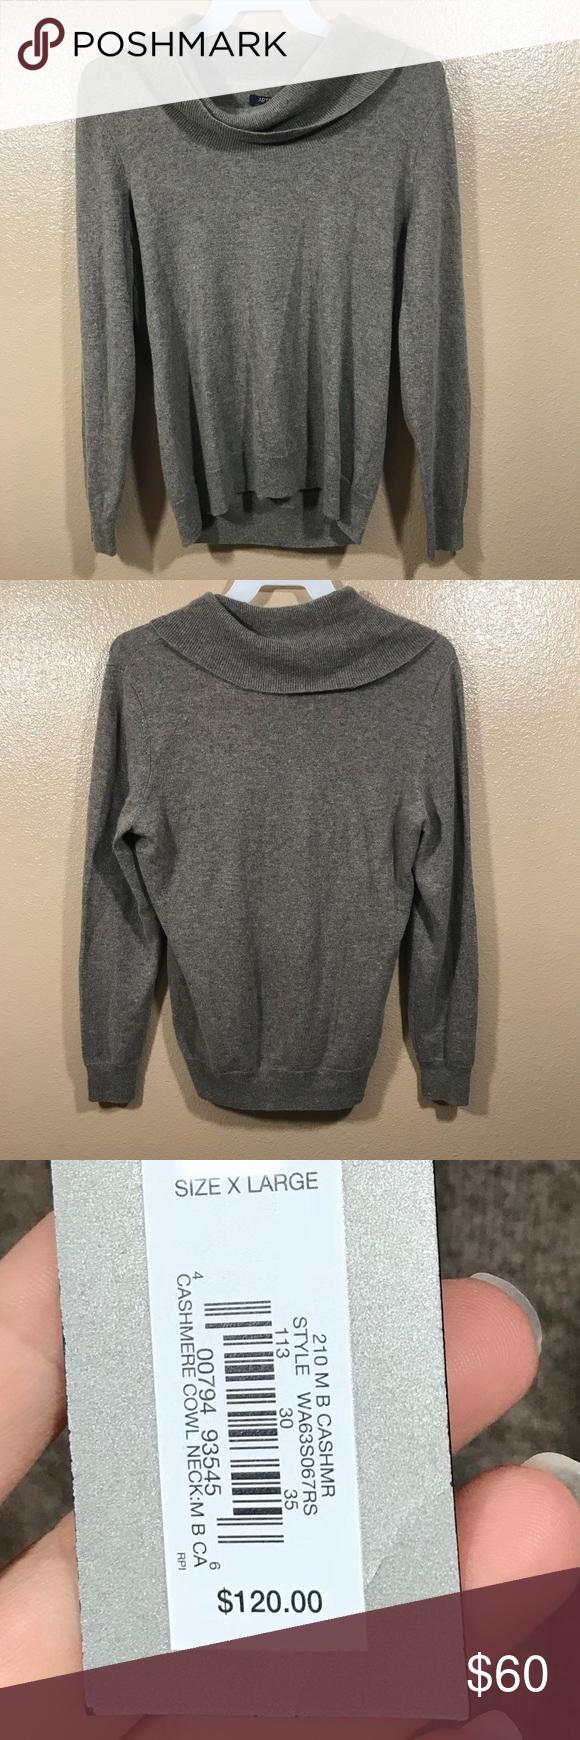 Apt 9 Cashmere Sweater Nwt In 2018 My Posh Picks Pinterest